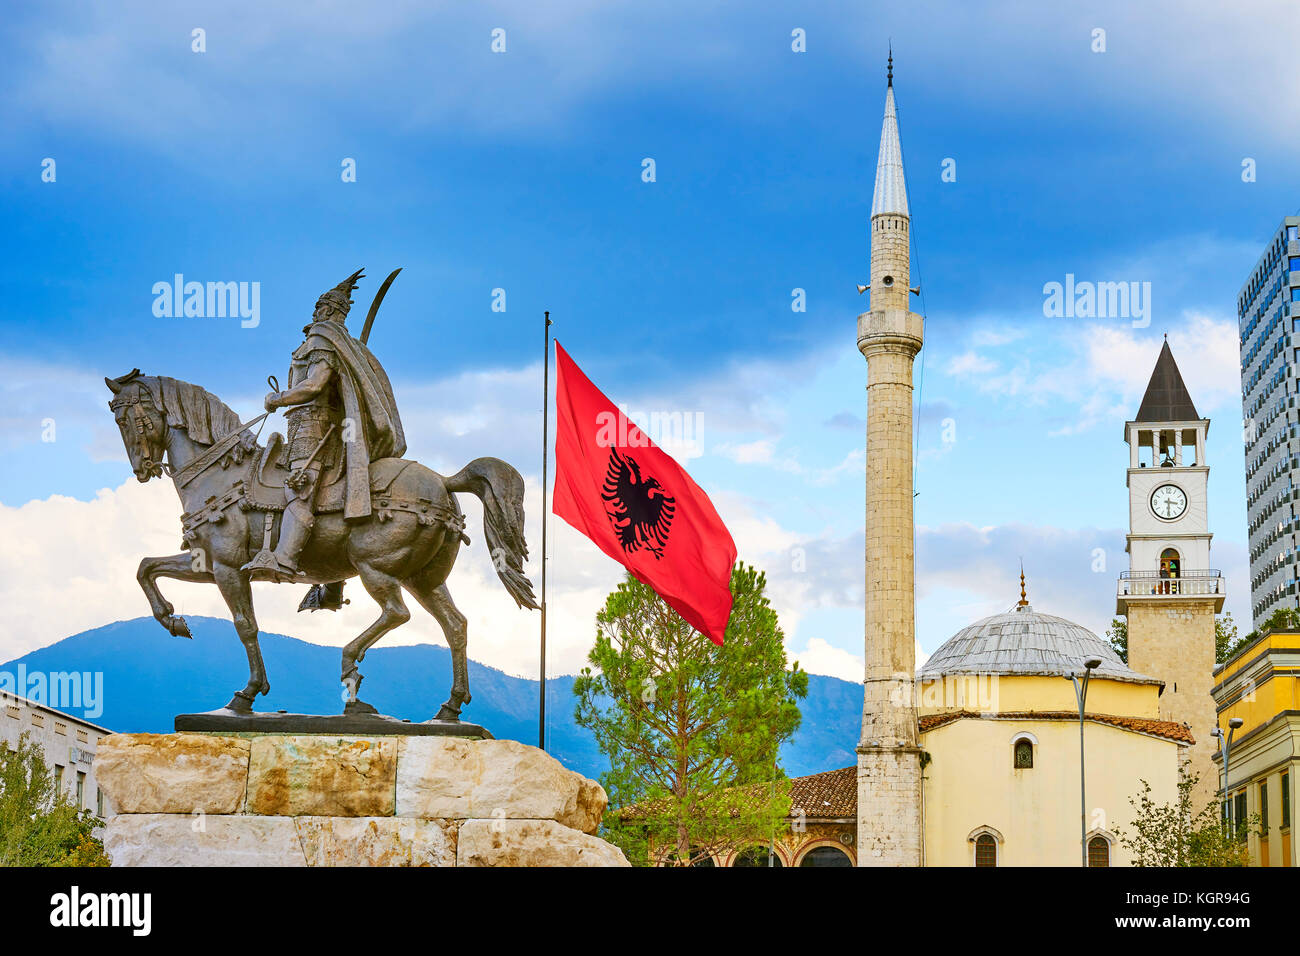 Albania, Tirana - statue of Skanderbeg, Ethem Bey Mosque, Skanderbeg Square - Stock Image